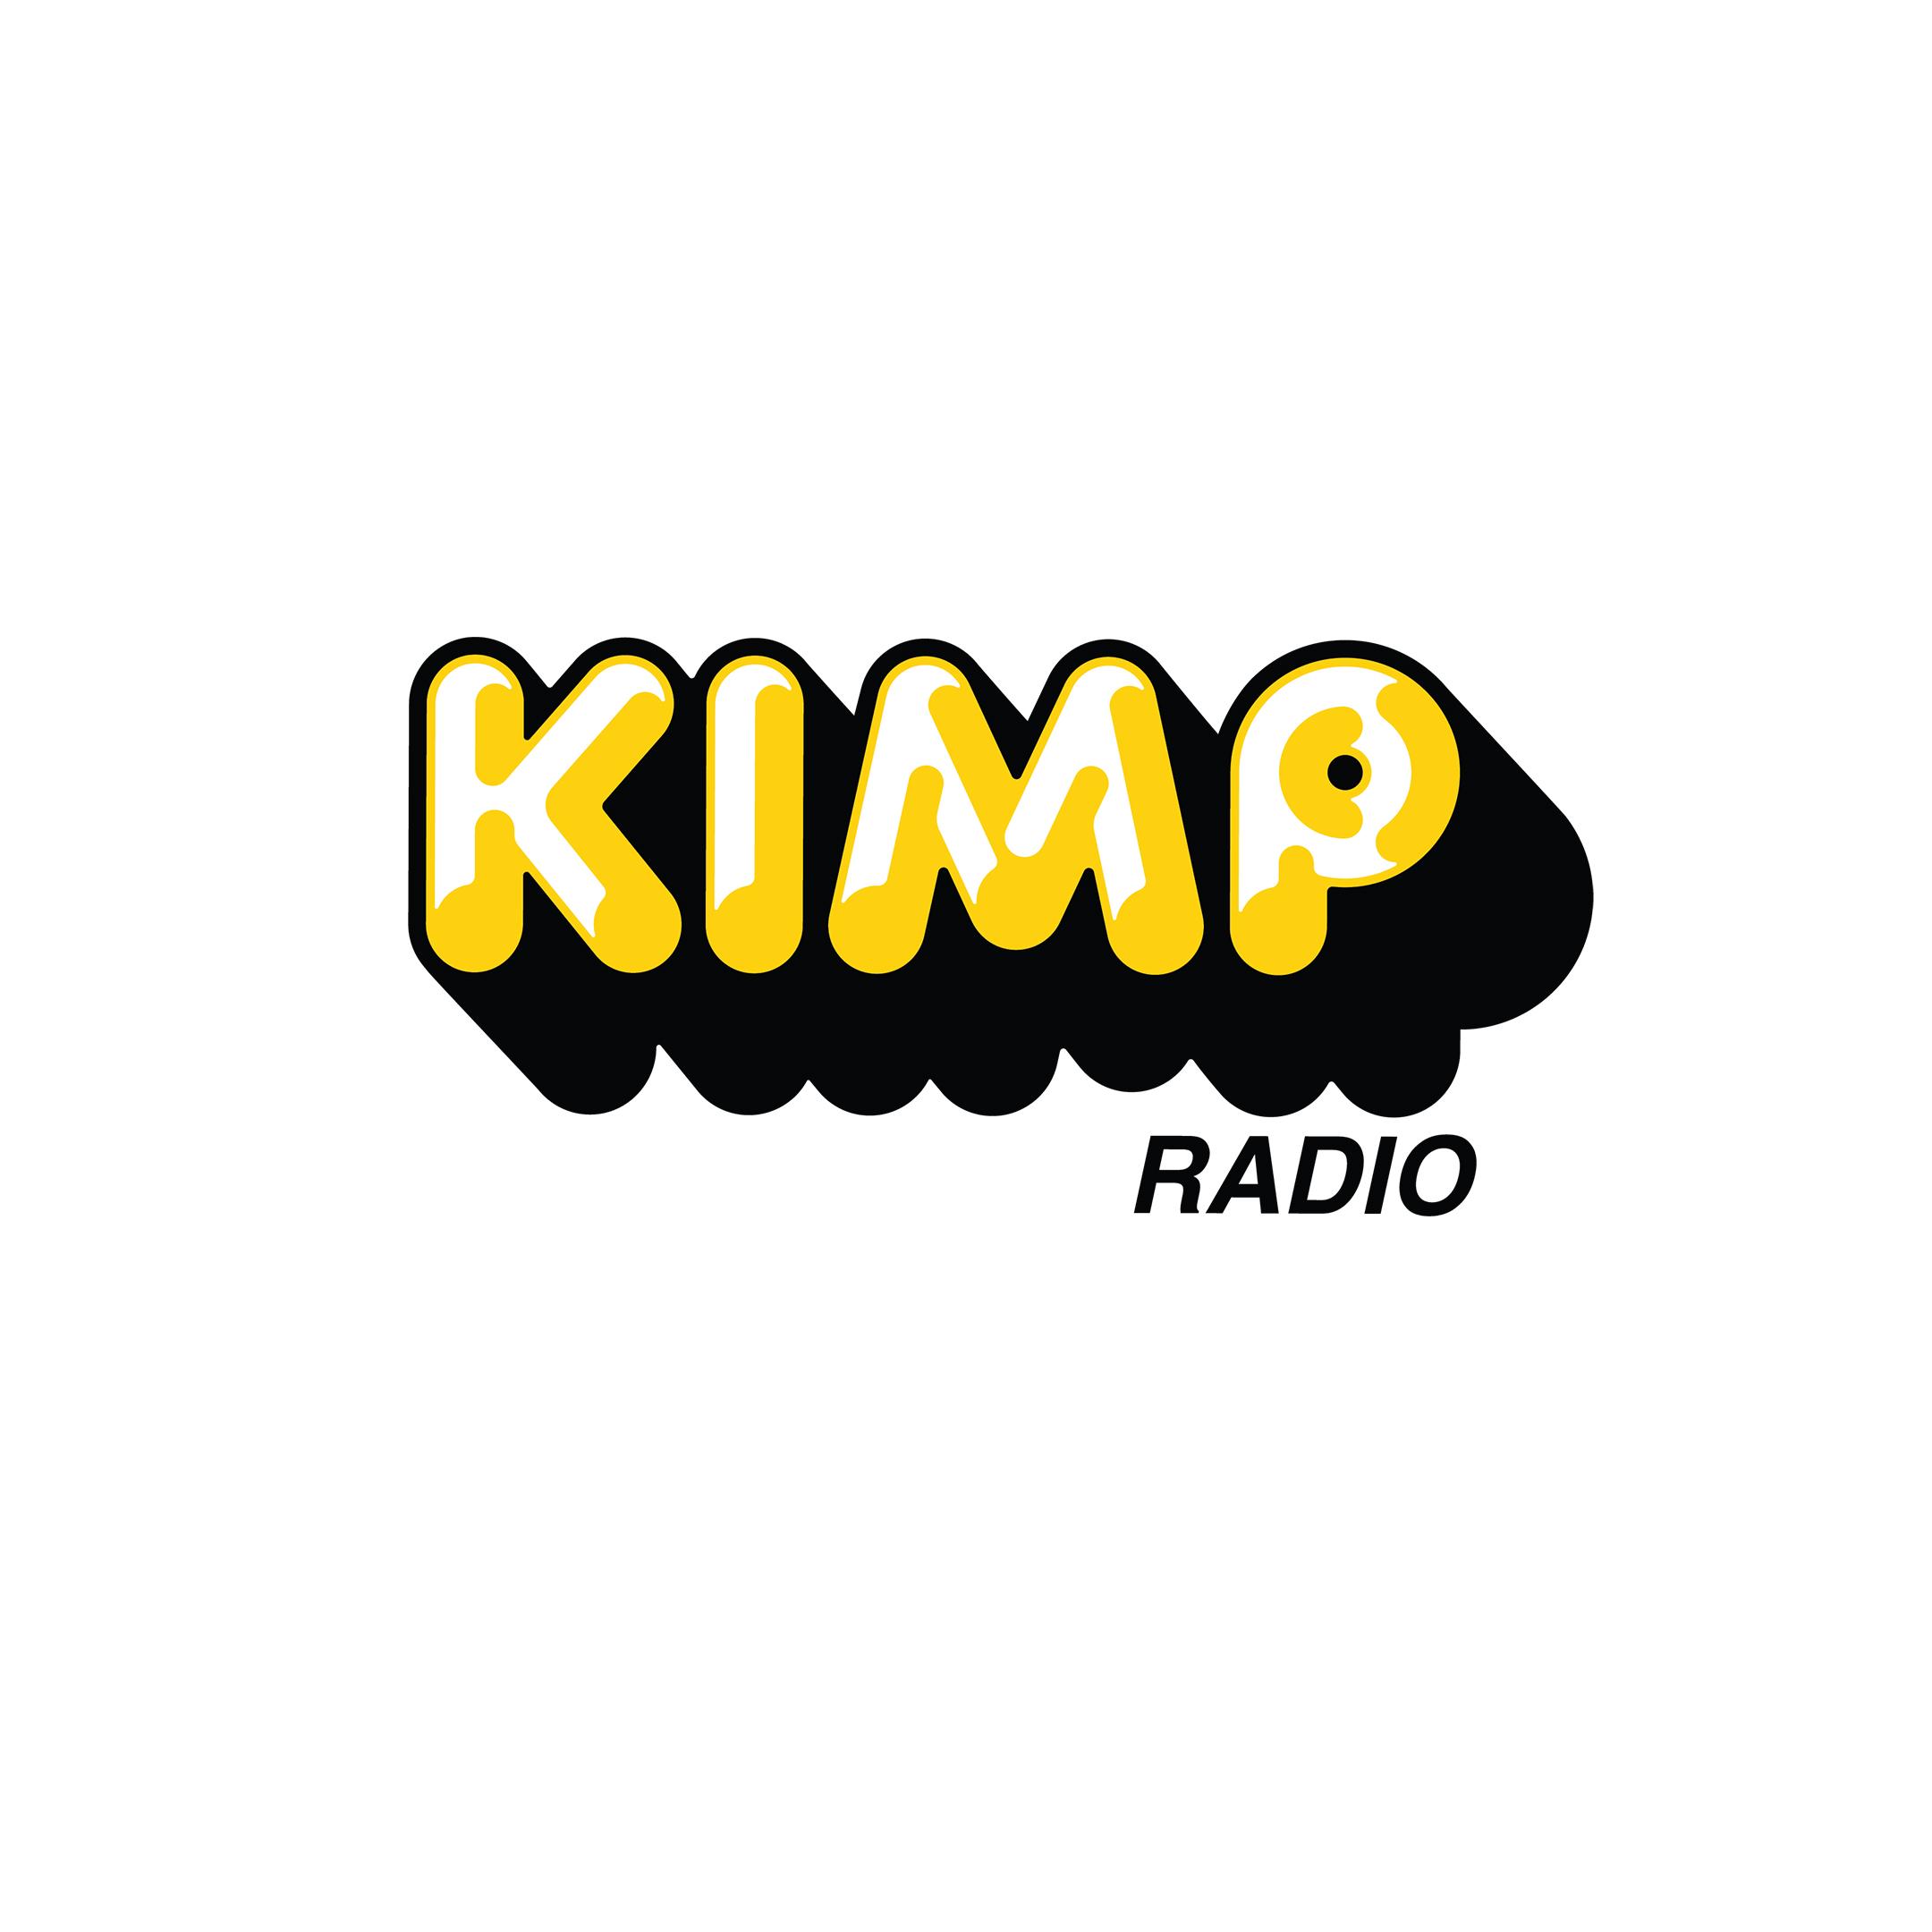 KIMP Radio